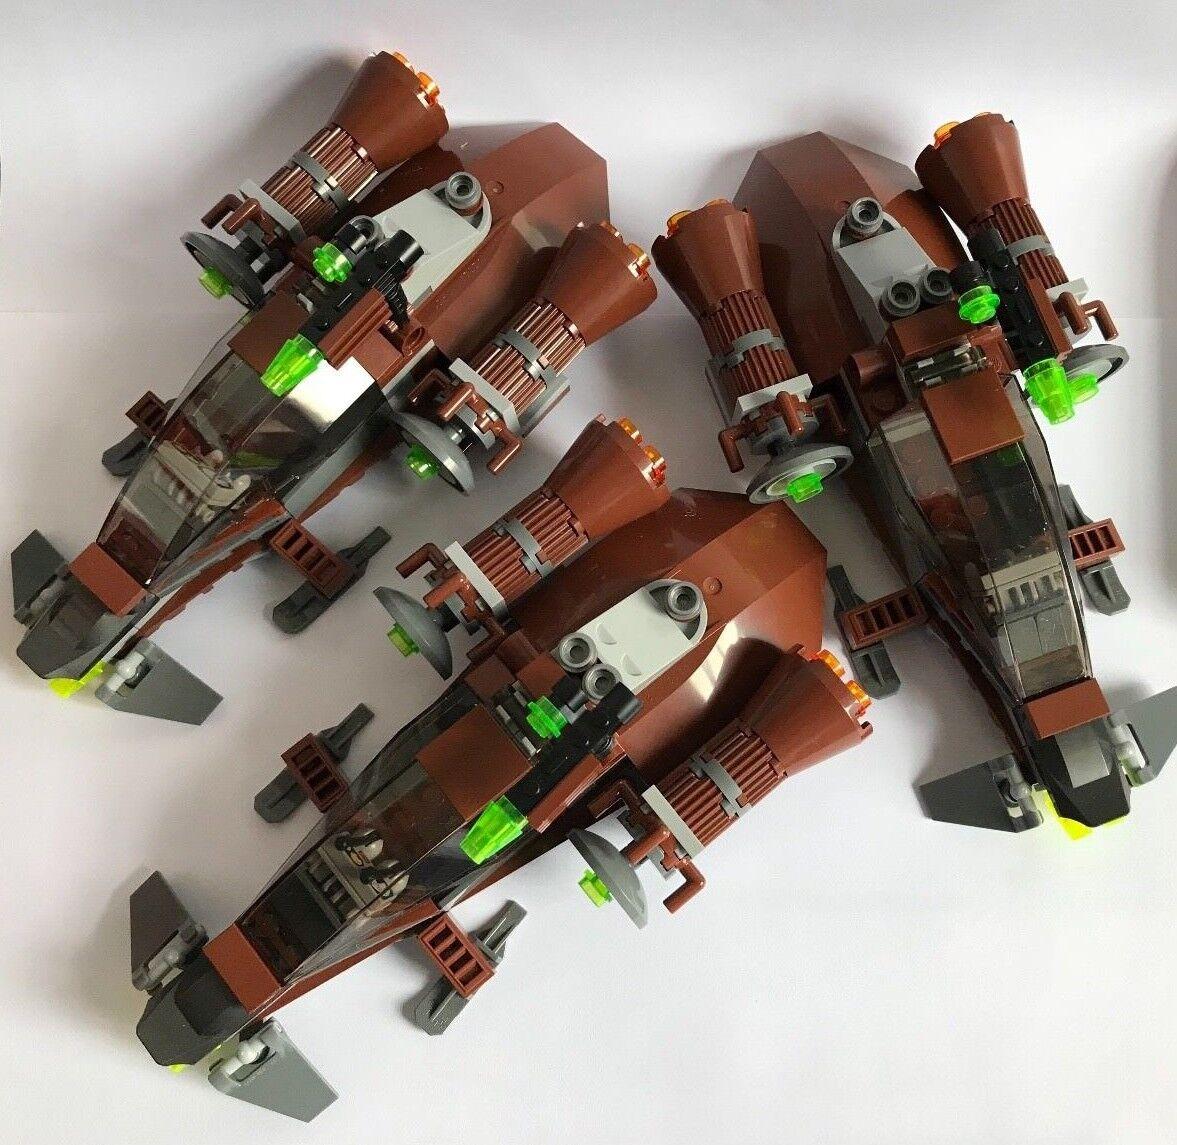 LEGO parts only - ENDOR REBEL SQUADRON - STAR WARS - 3 FOREST BIKES my design